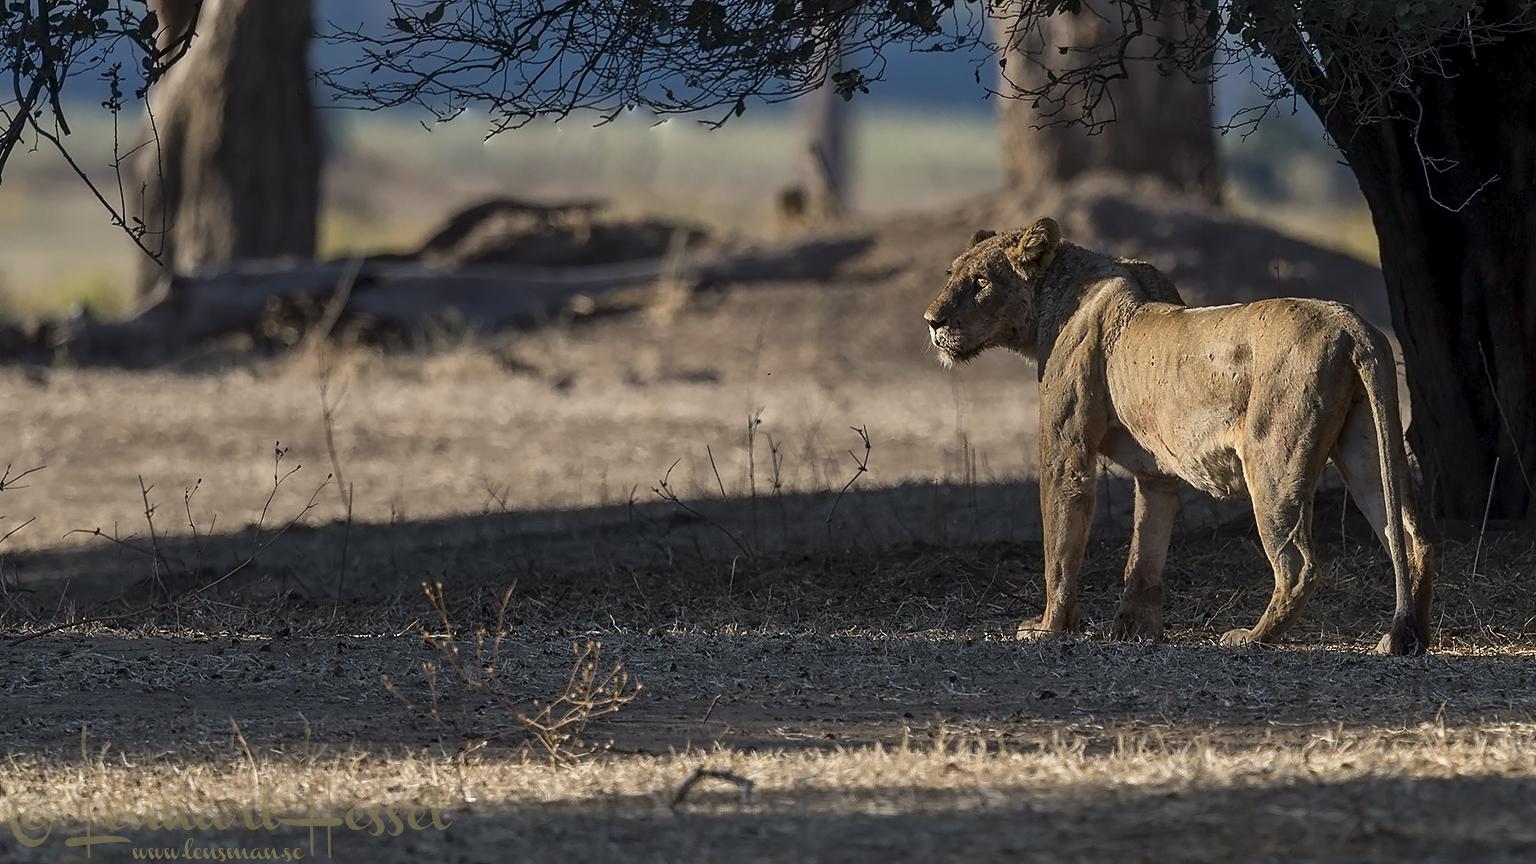 Lioness seen on safari in Mana Pools